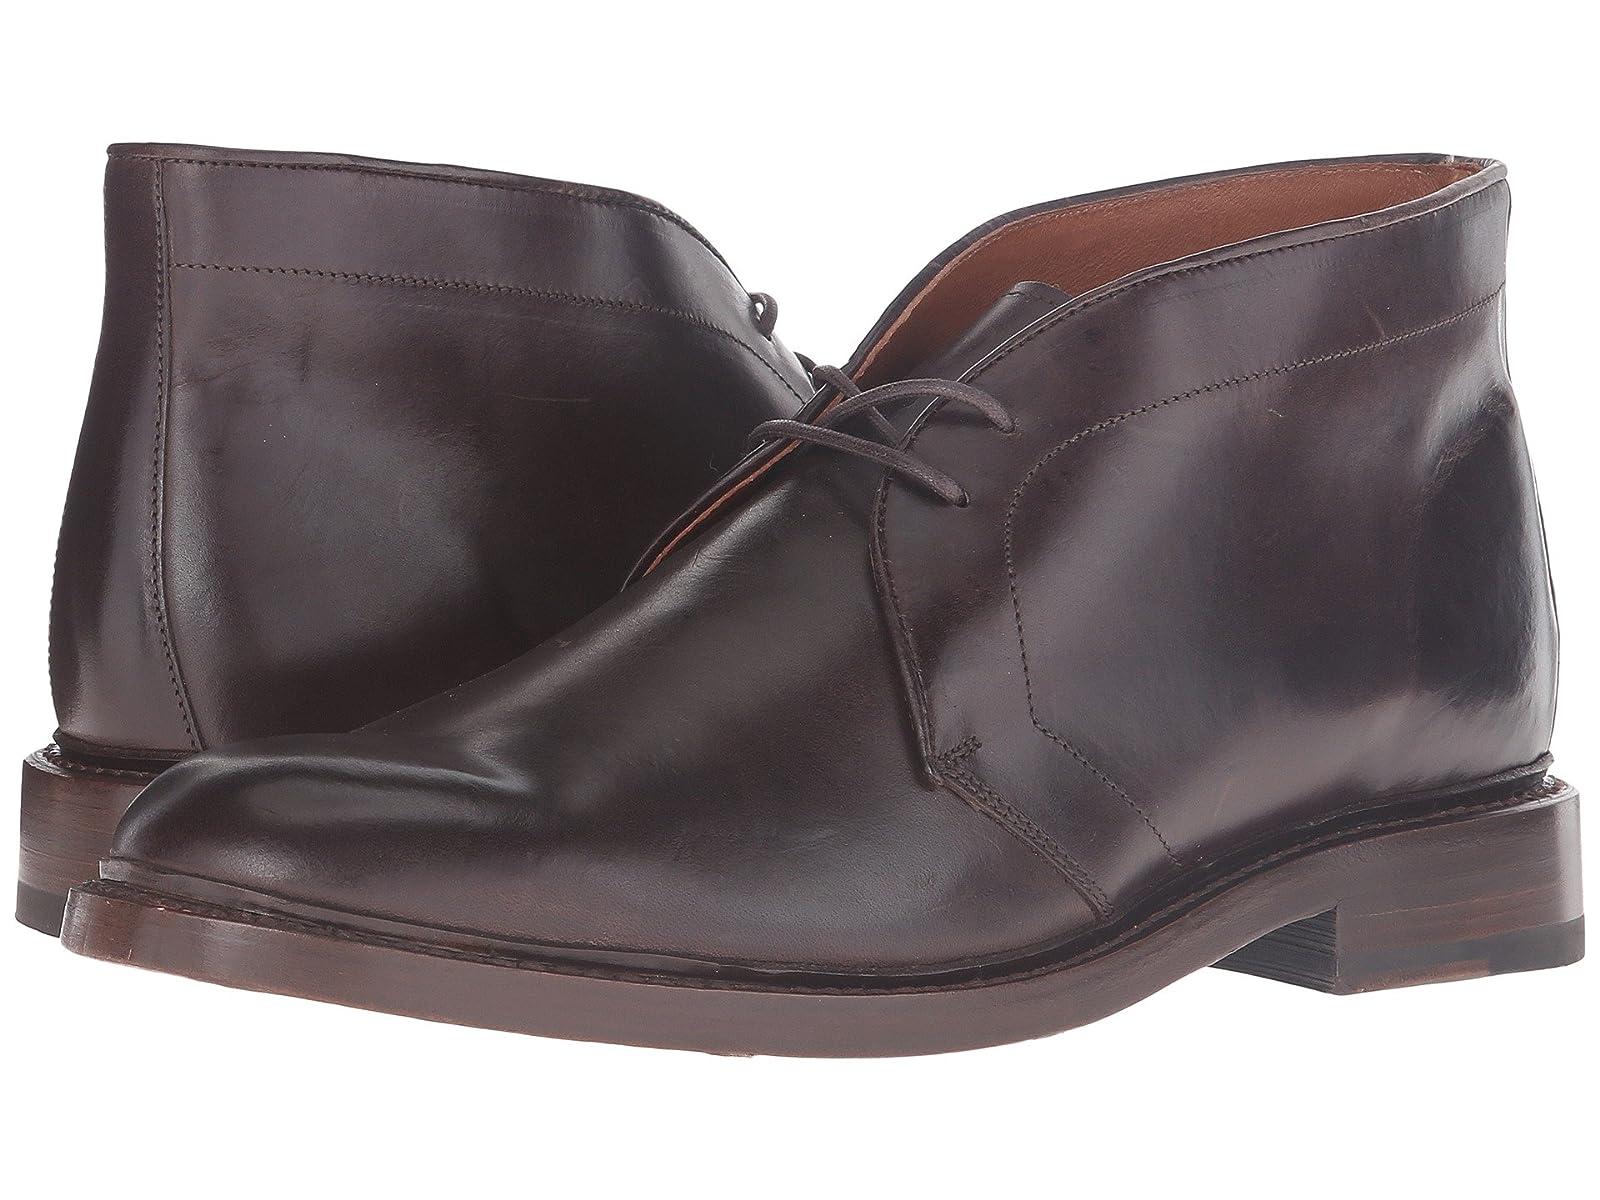 Frye Jones ChukkaAffordable and distinctive shoes